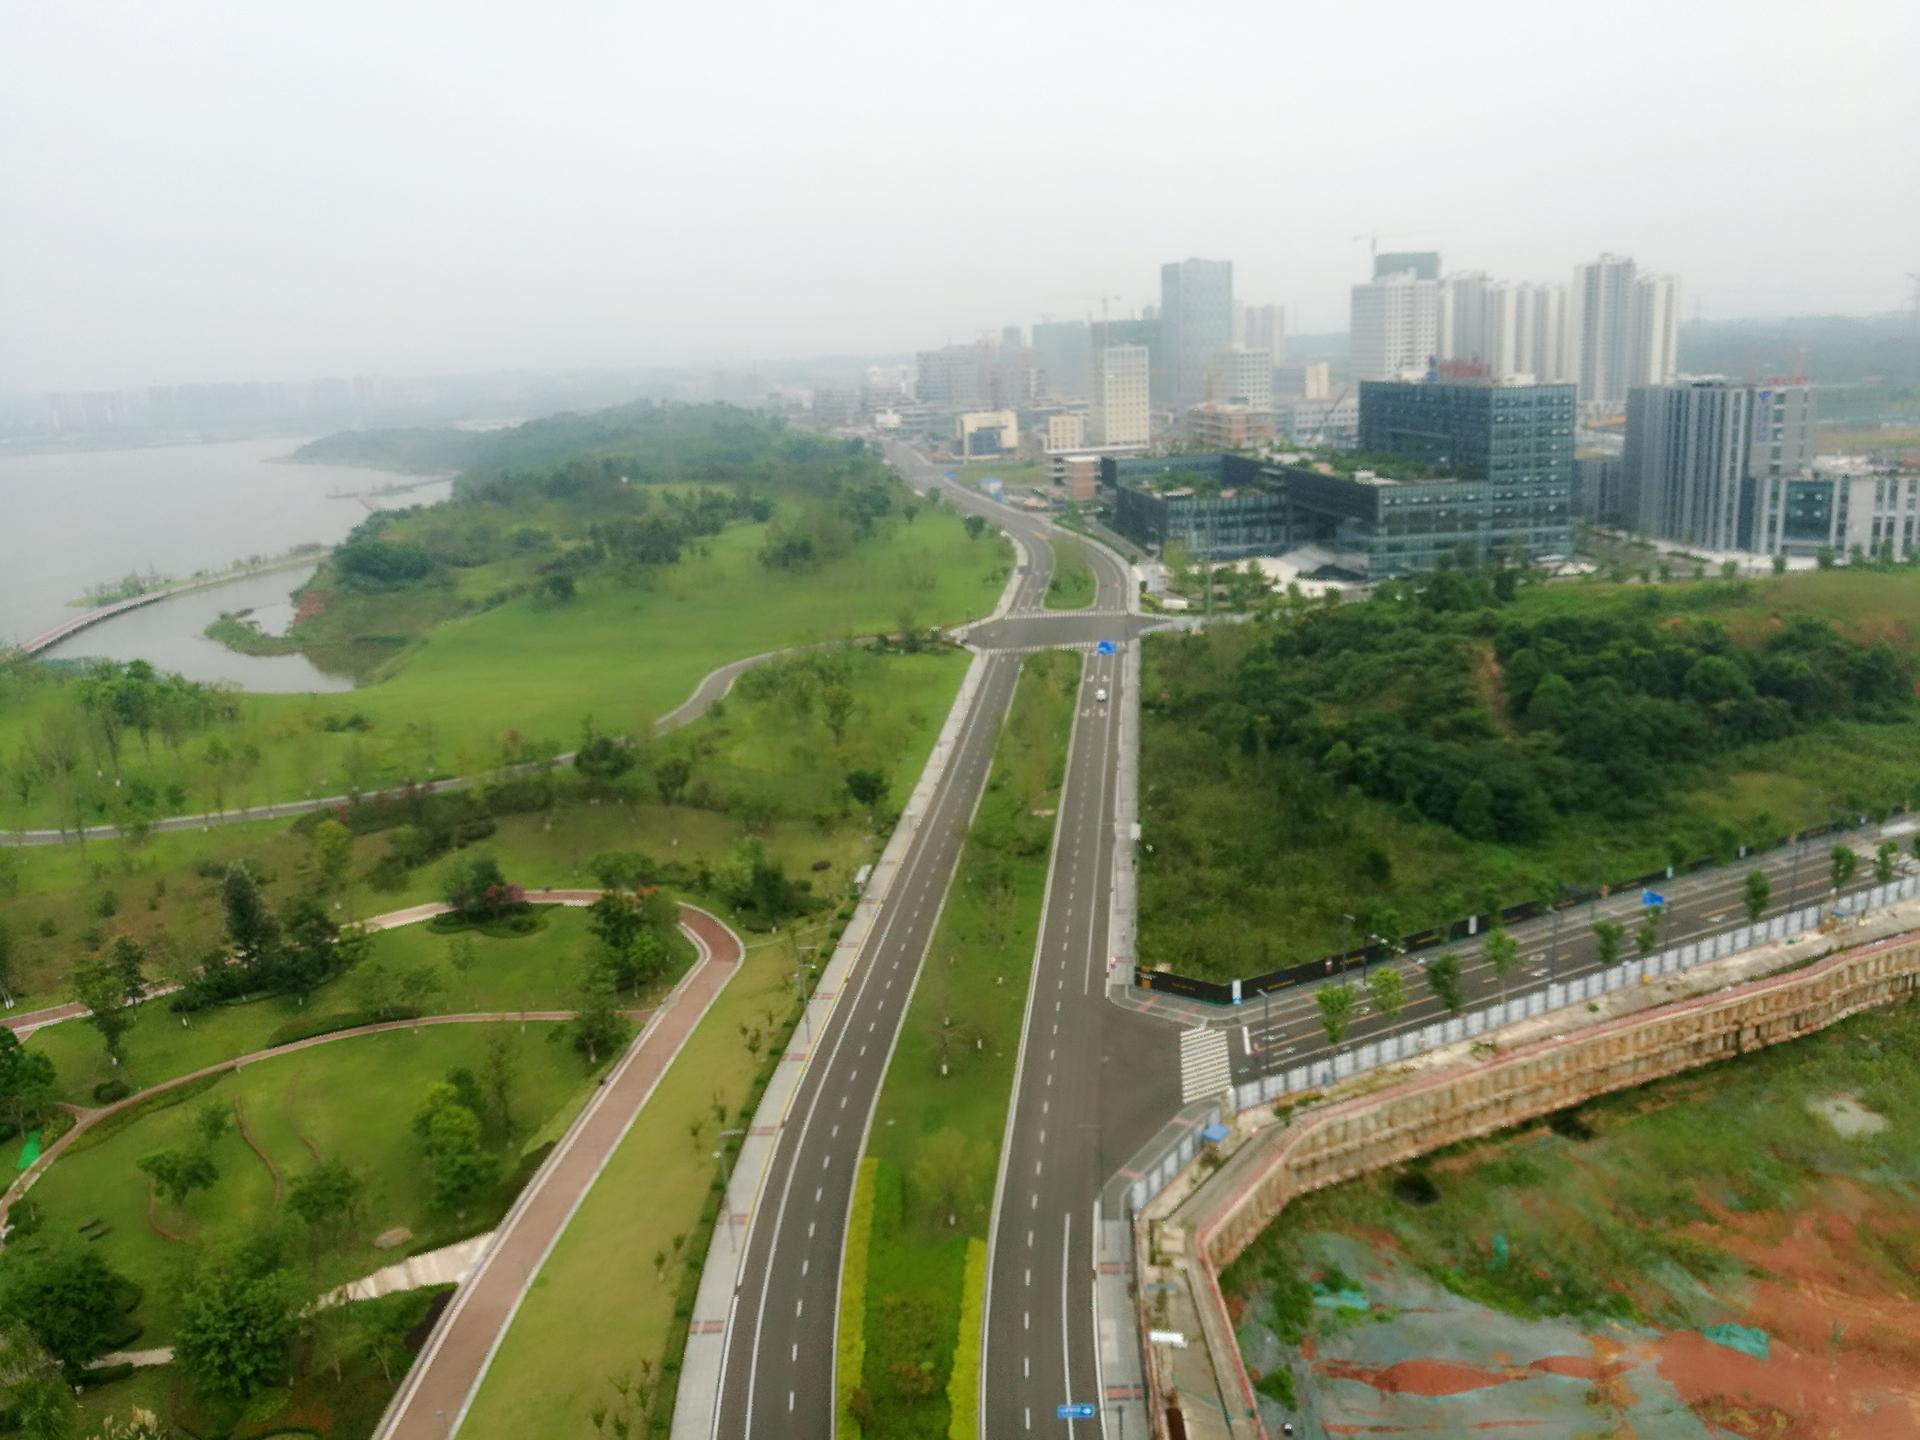 G5京昆高速绵广段大修完毕 入川道路将于29日恢复通车